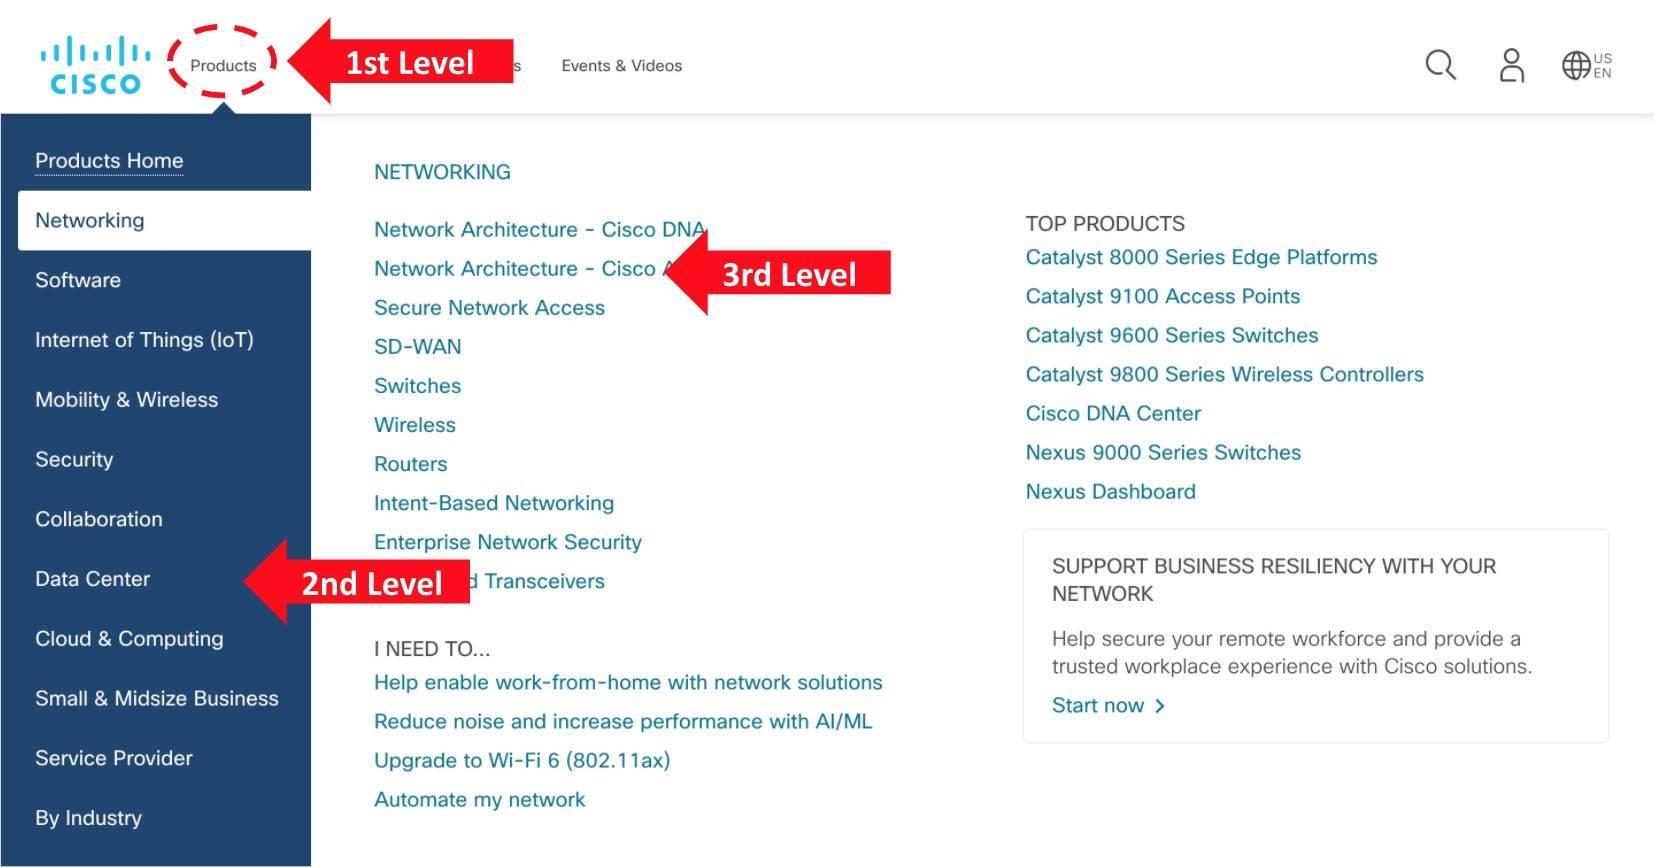 Cisco 网站主页上的扩展导航菜单示例